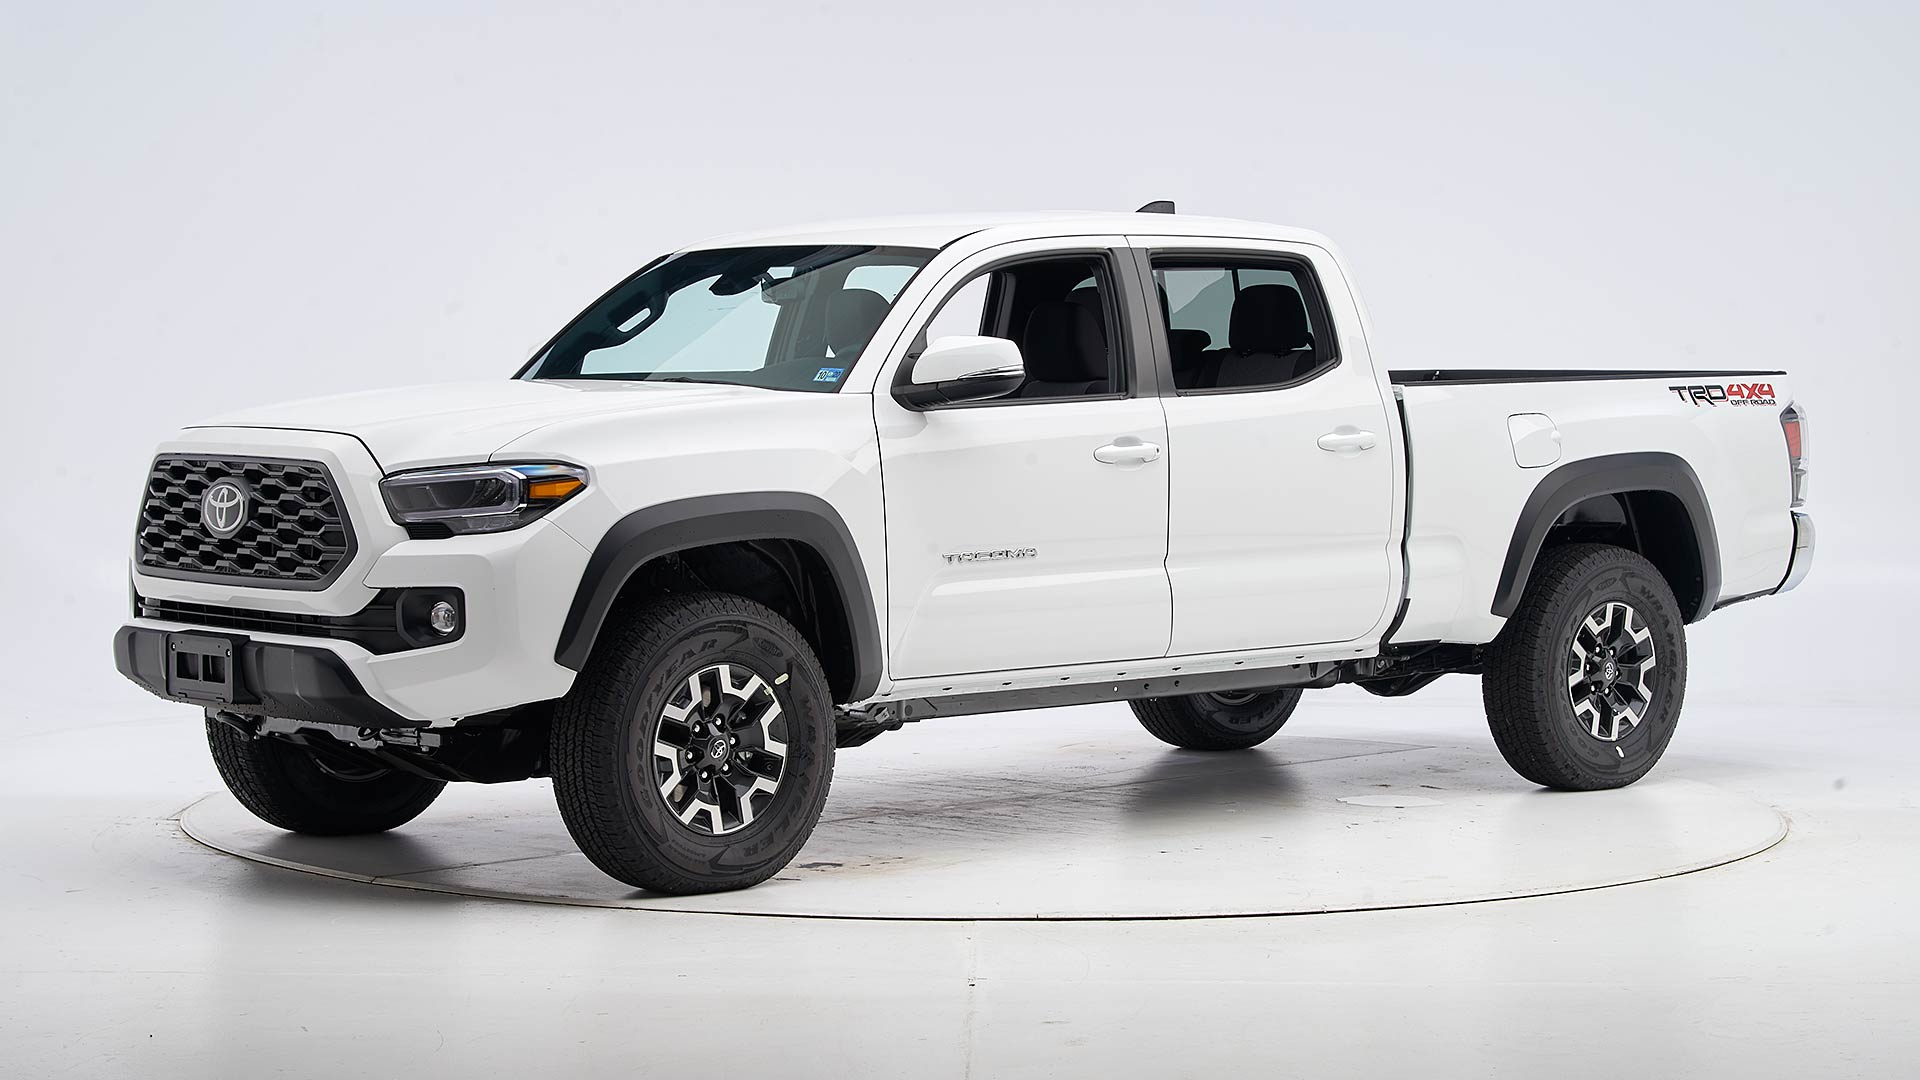 2020 Toyota Tacoma Photos